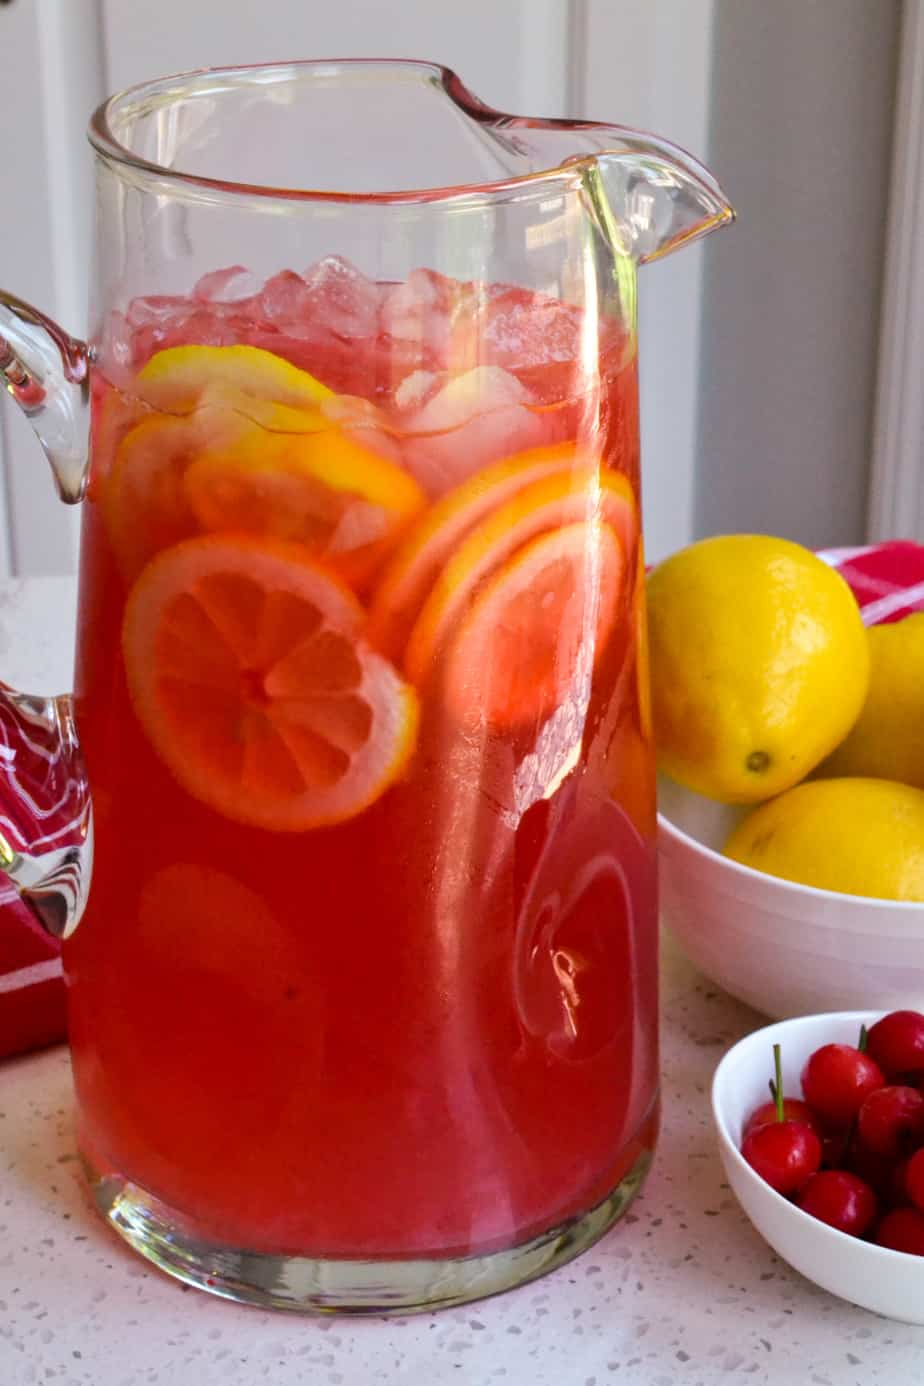 A pitcher of cherry lemonade.